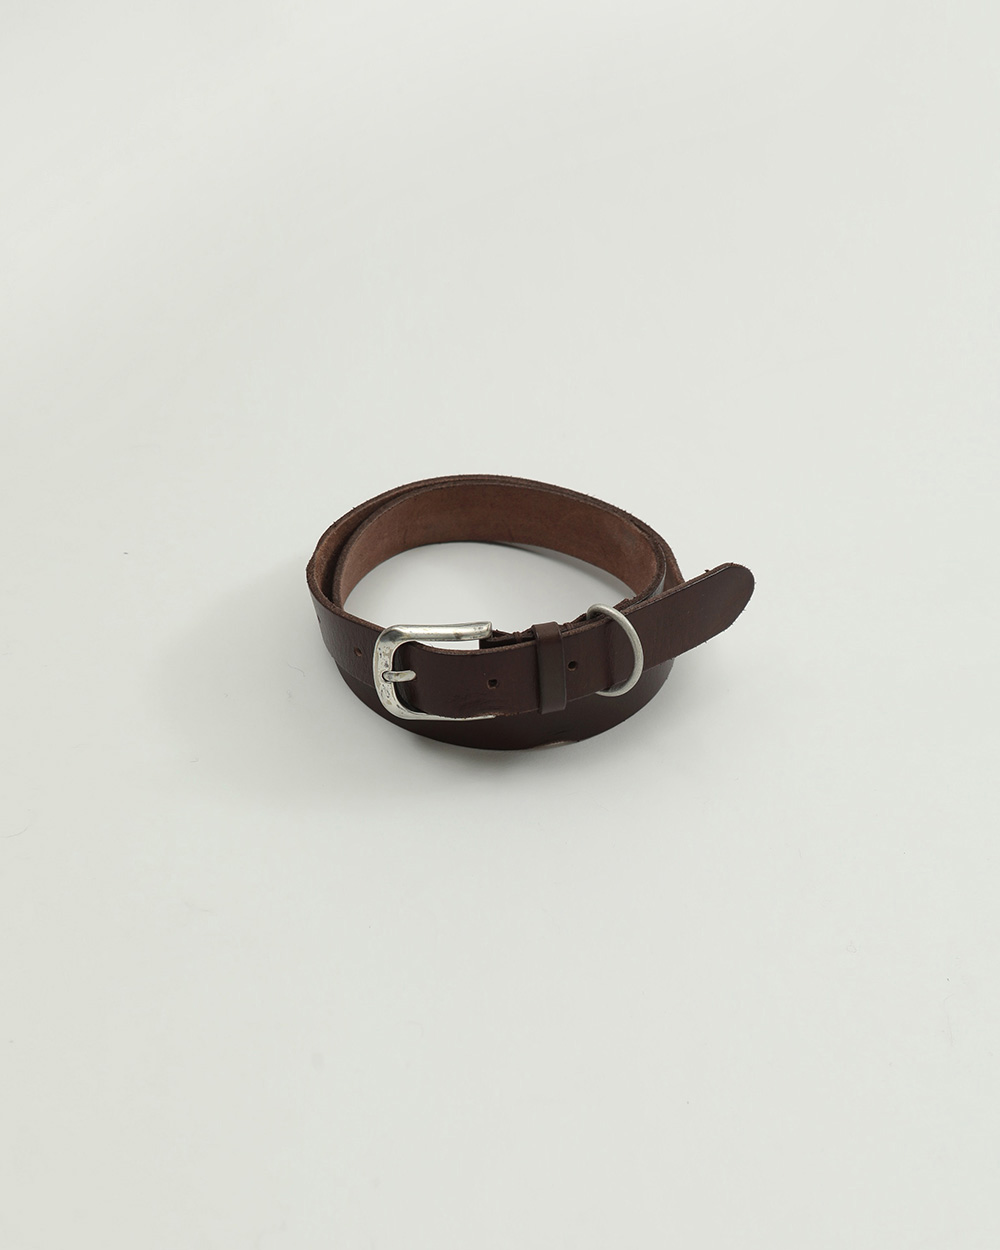 Vintage Edwardian Brass /& MOP Cuff Links or Shirtwaist Set circa 1900 from DustyMillerAntiques